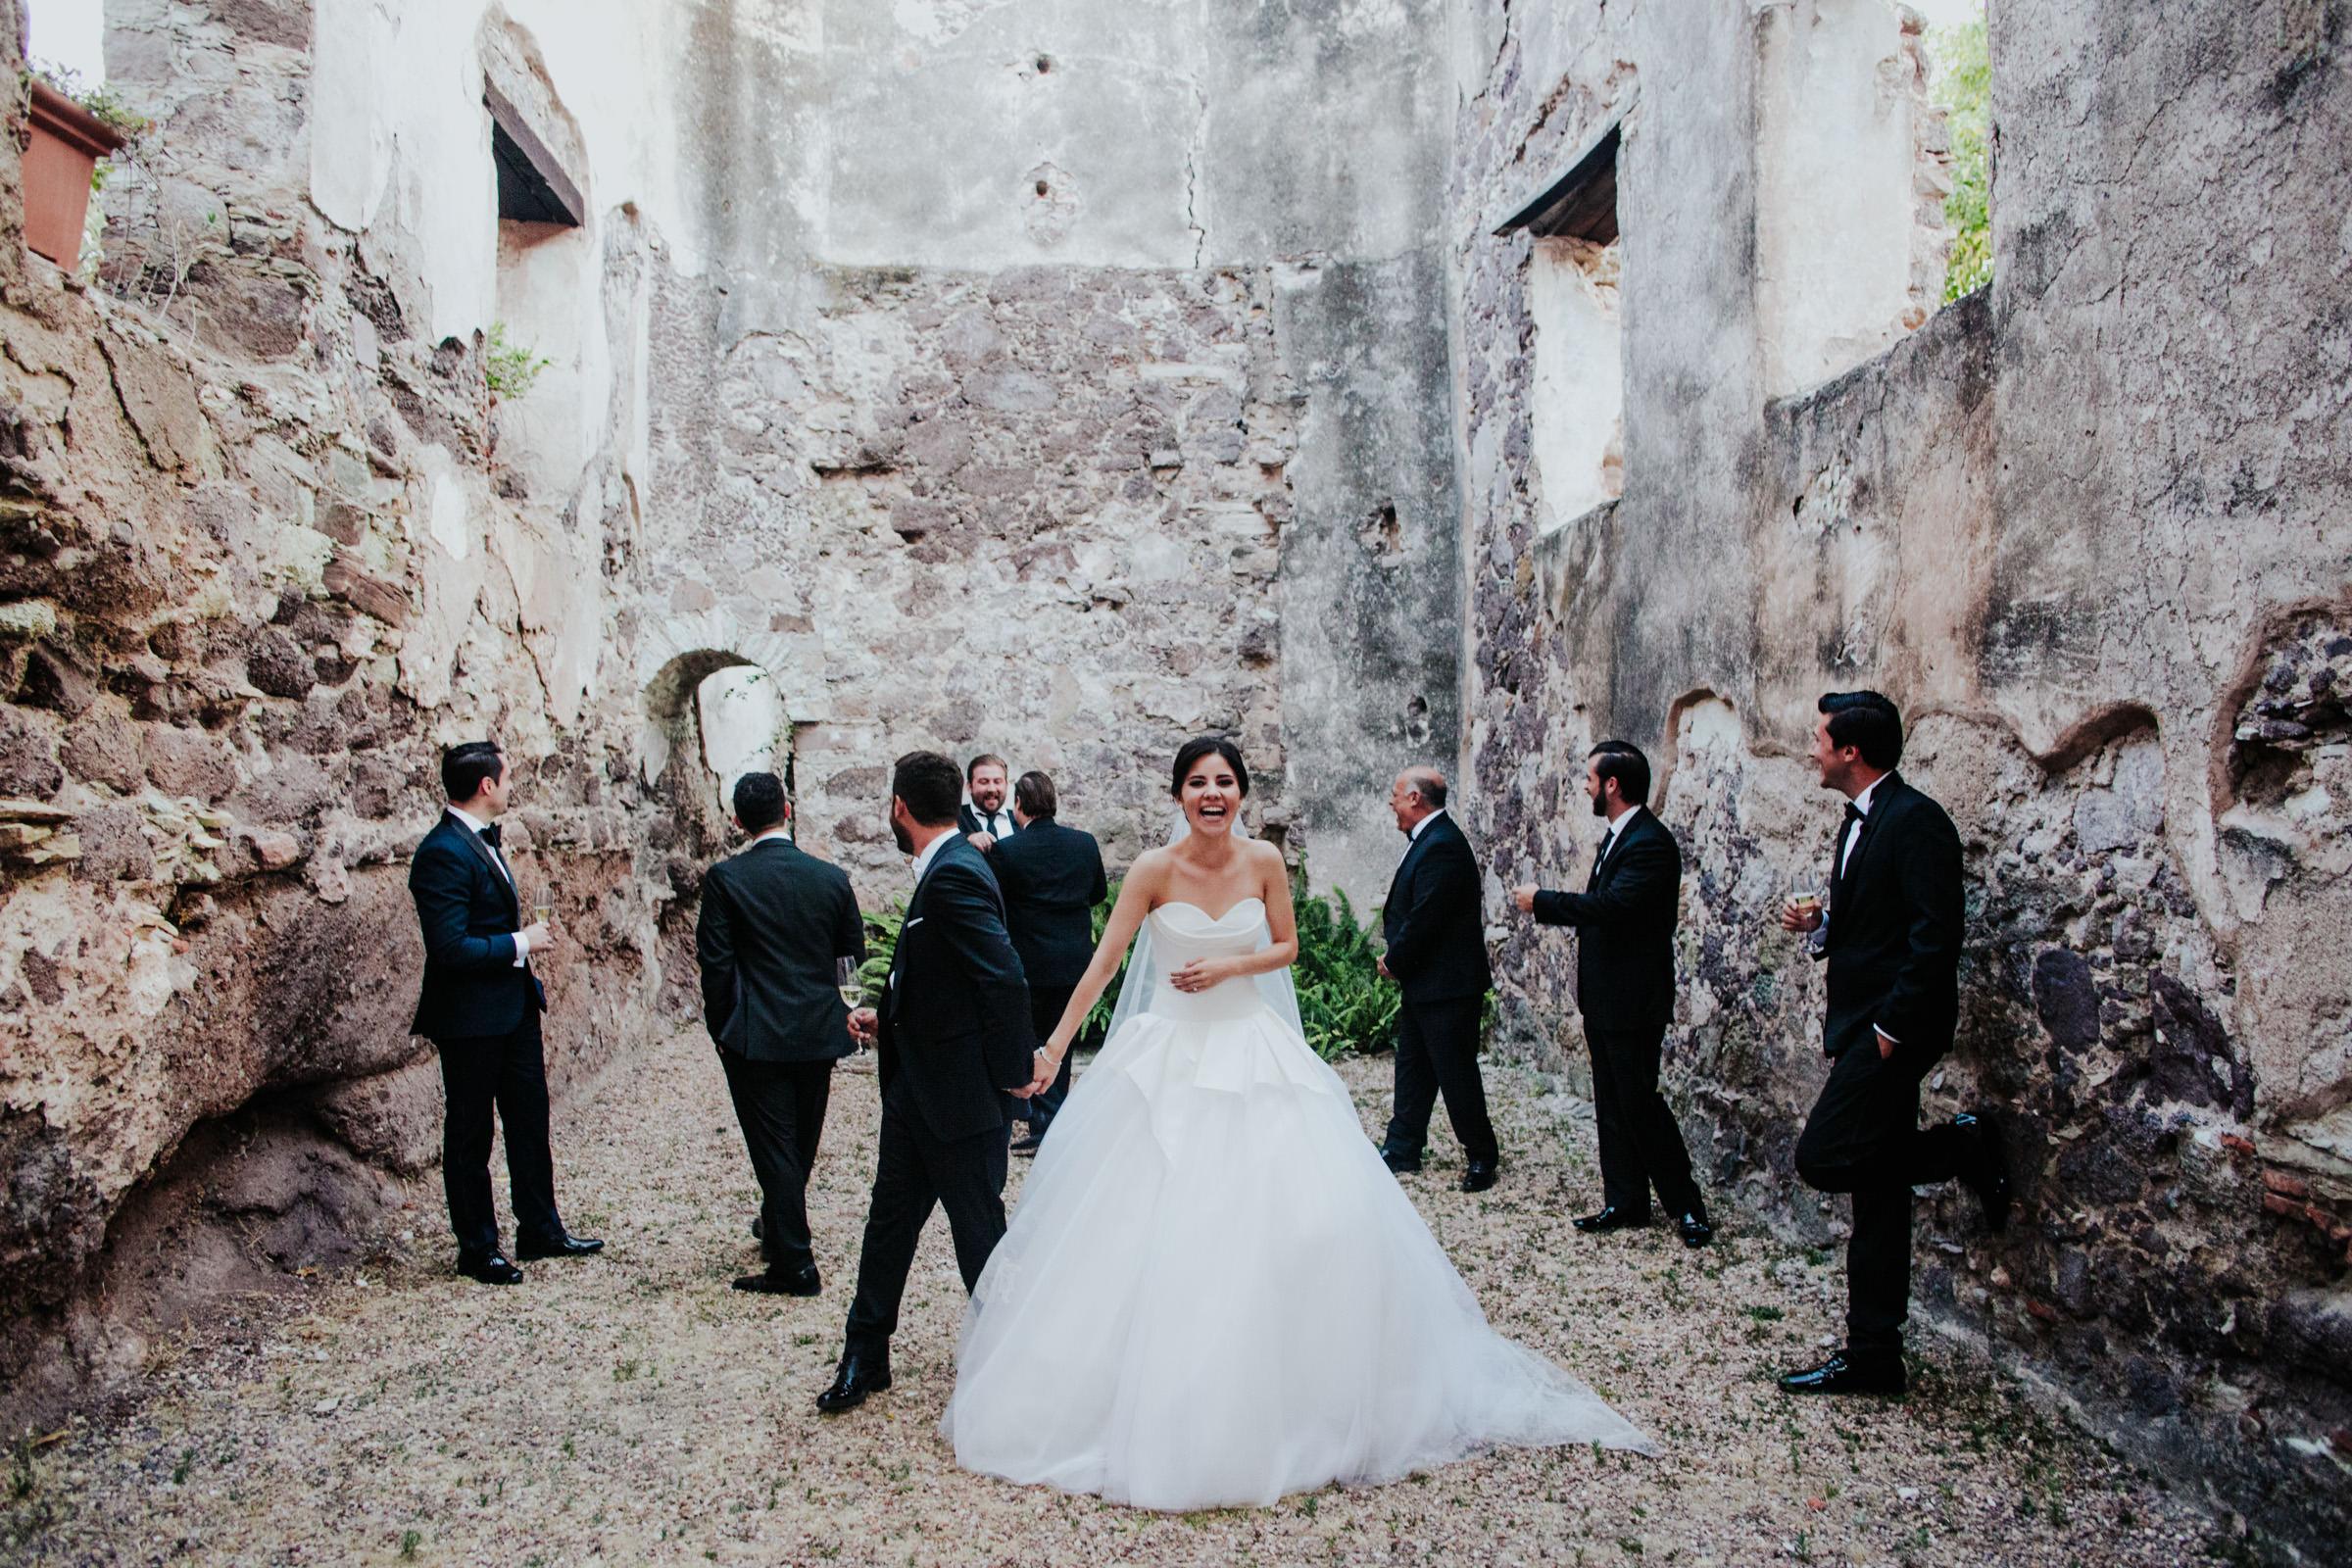 Boda-Guanajuato-Antigua-Hacienda-Dolores-Barrera-Fotografia-Pierce-Photography-Mariana-Jorge--228.jpg